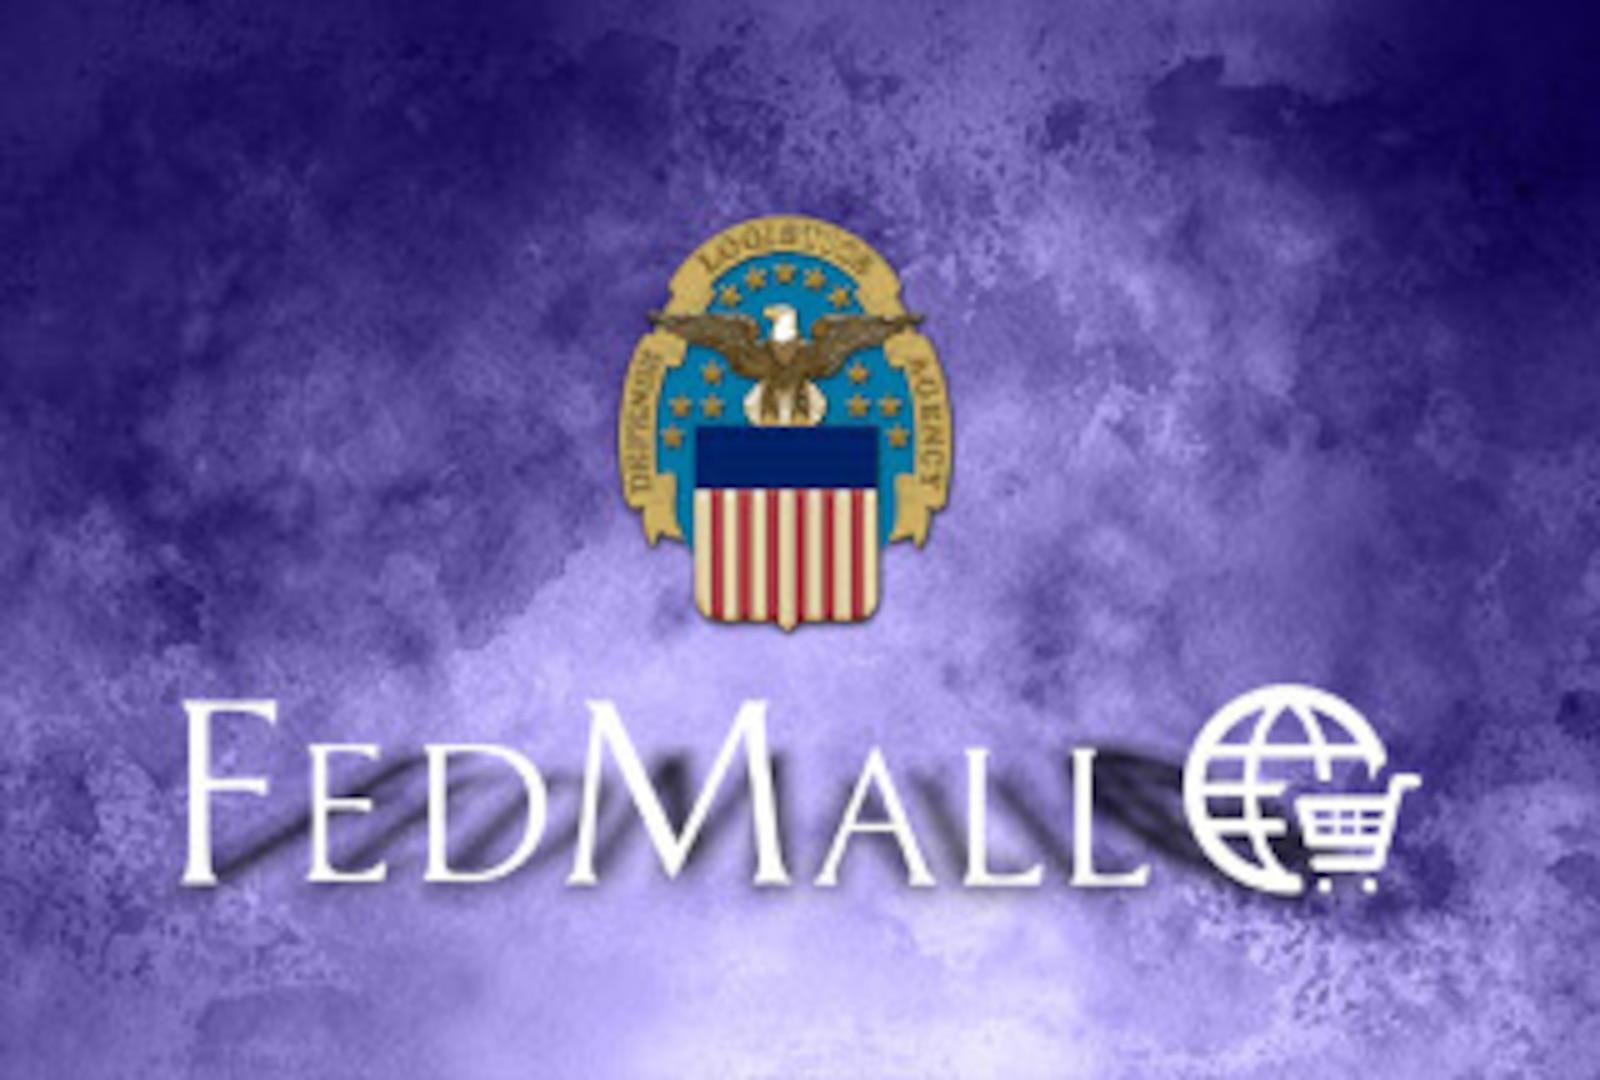 FedMall graphic with DLA logo.